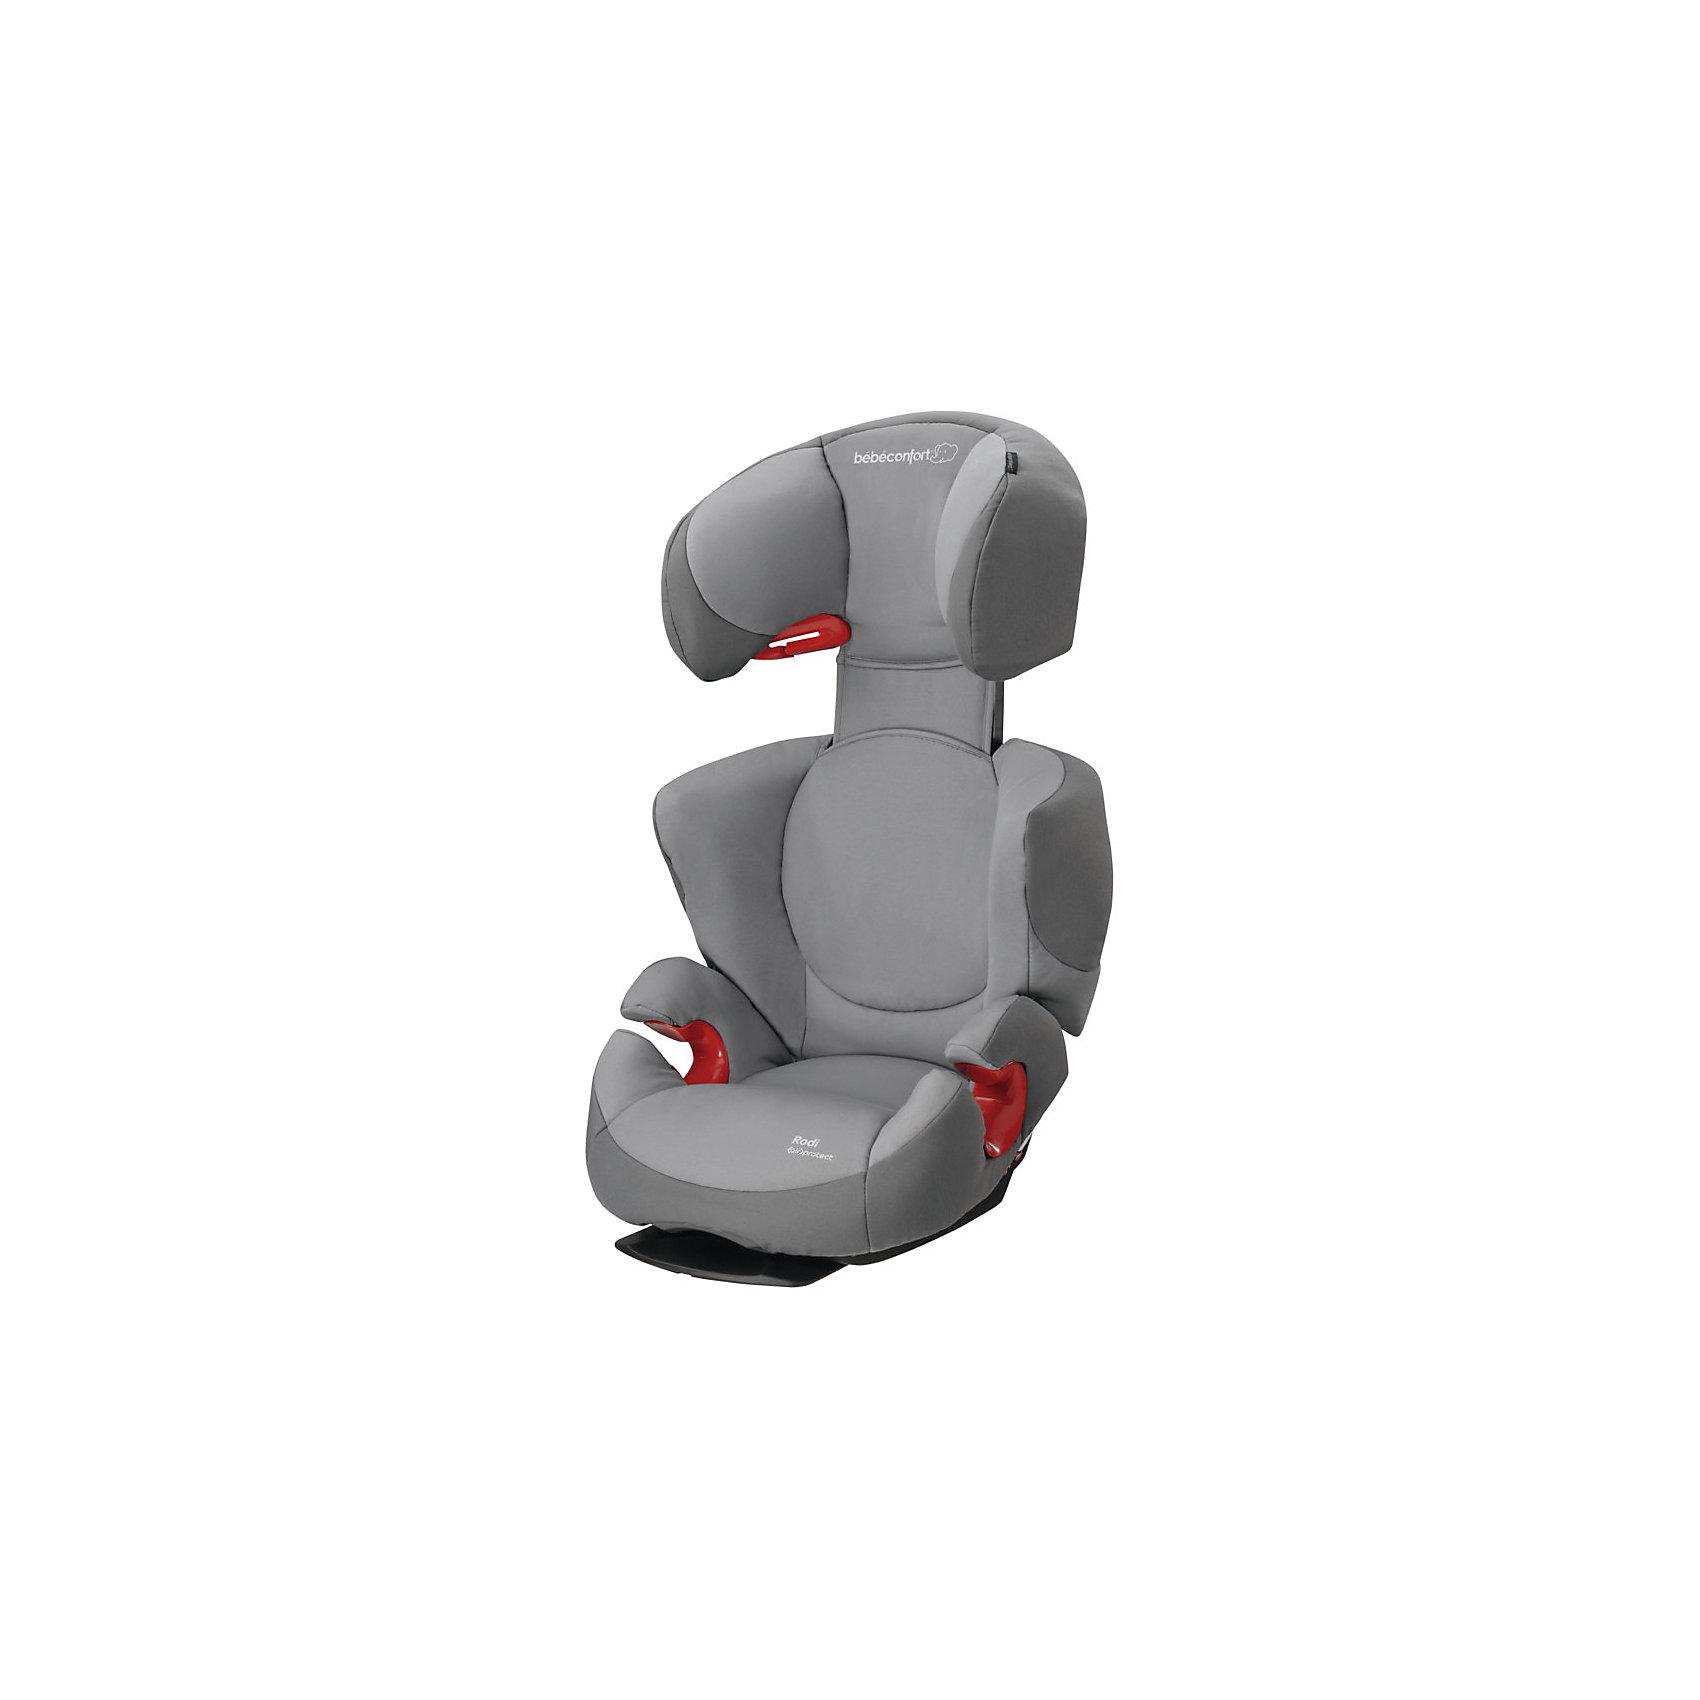 Maxi Cosi Автокресло Rodi Air, 15-36 кг., Maxi Cosi, Concrete Grey